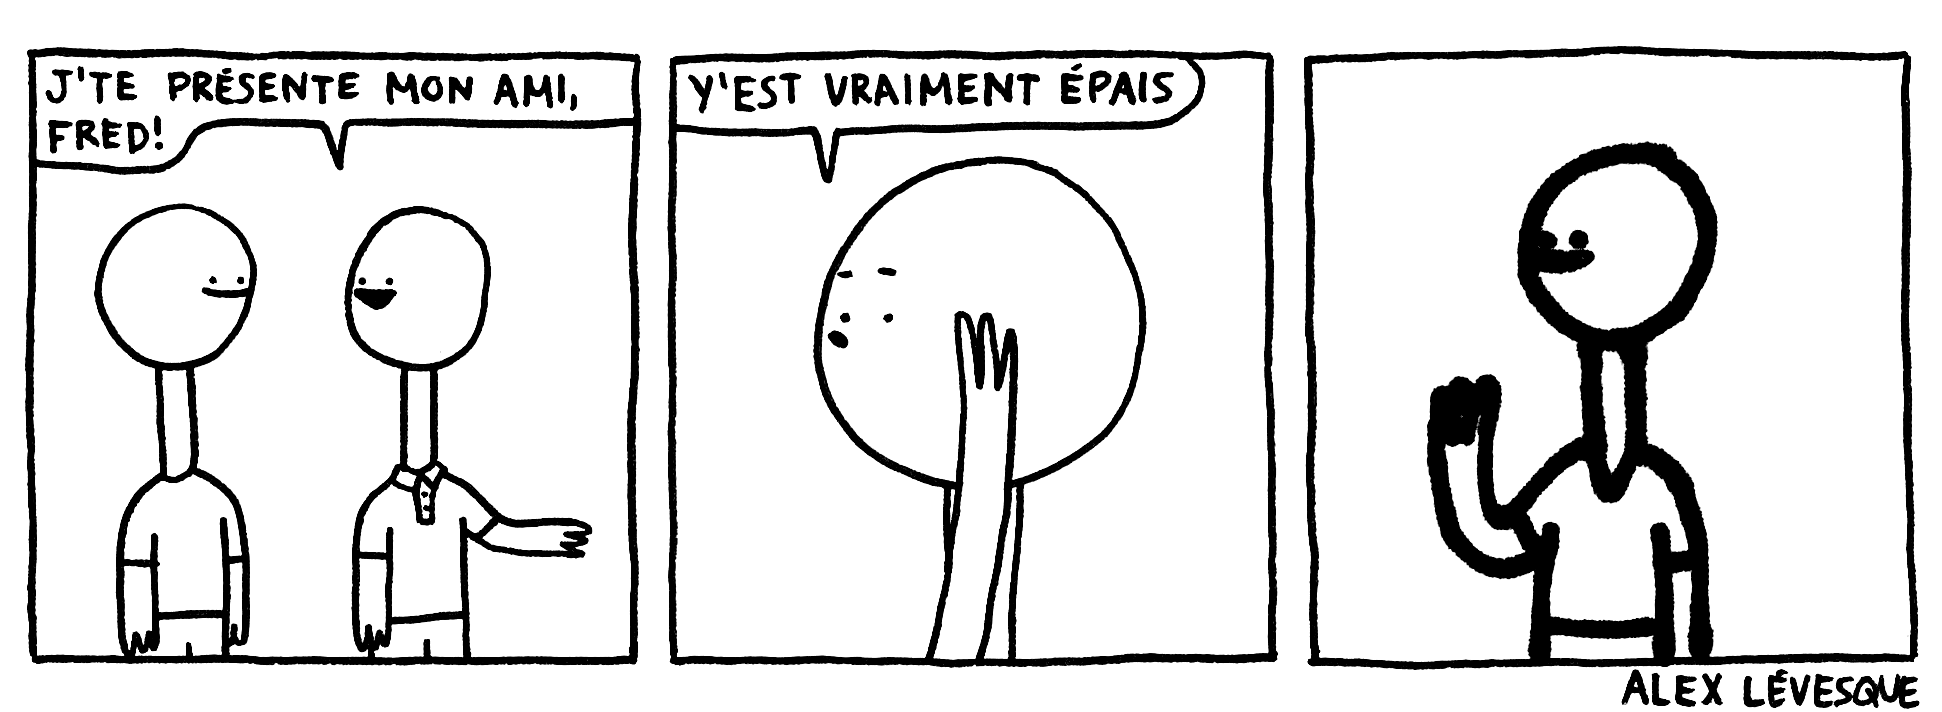 Épais